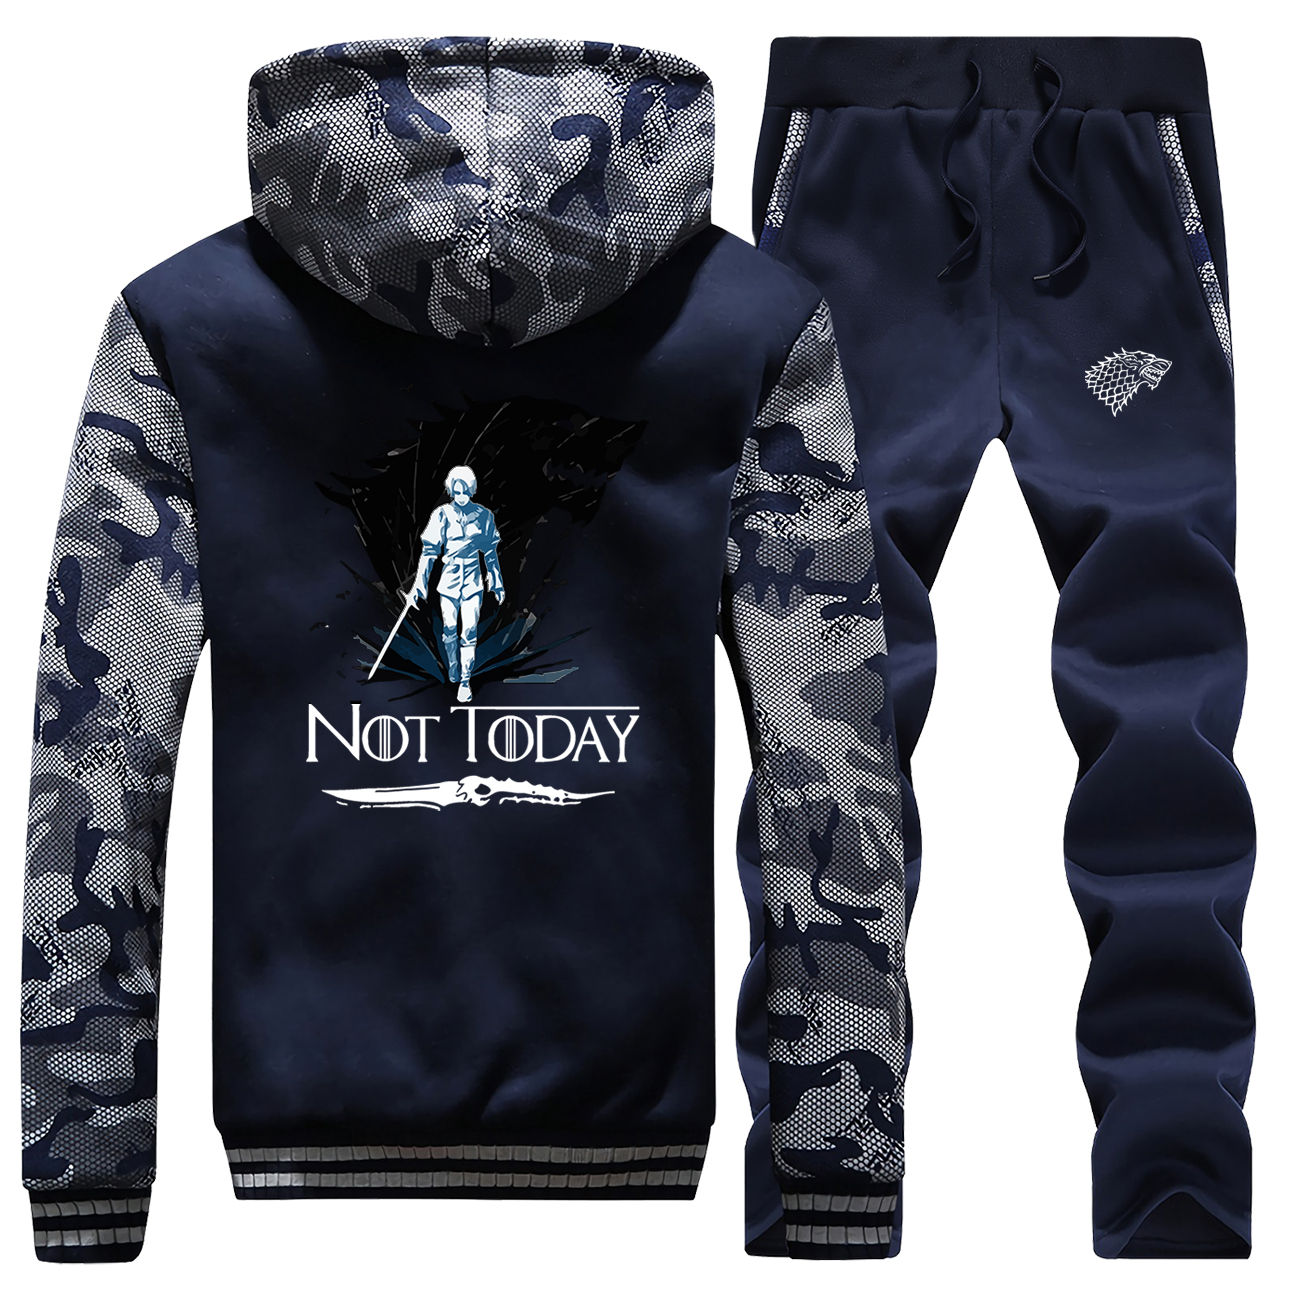 Game Of Thrones Hoodies Pants Set Men Ayra House Stark Wolf Tracksuit Track Suit Winter Thicken Fleece Jacket Camo 2 Piece Sets